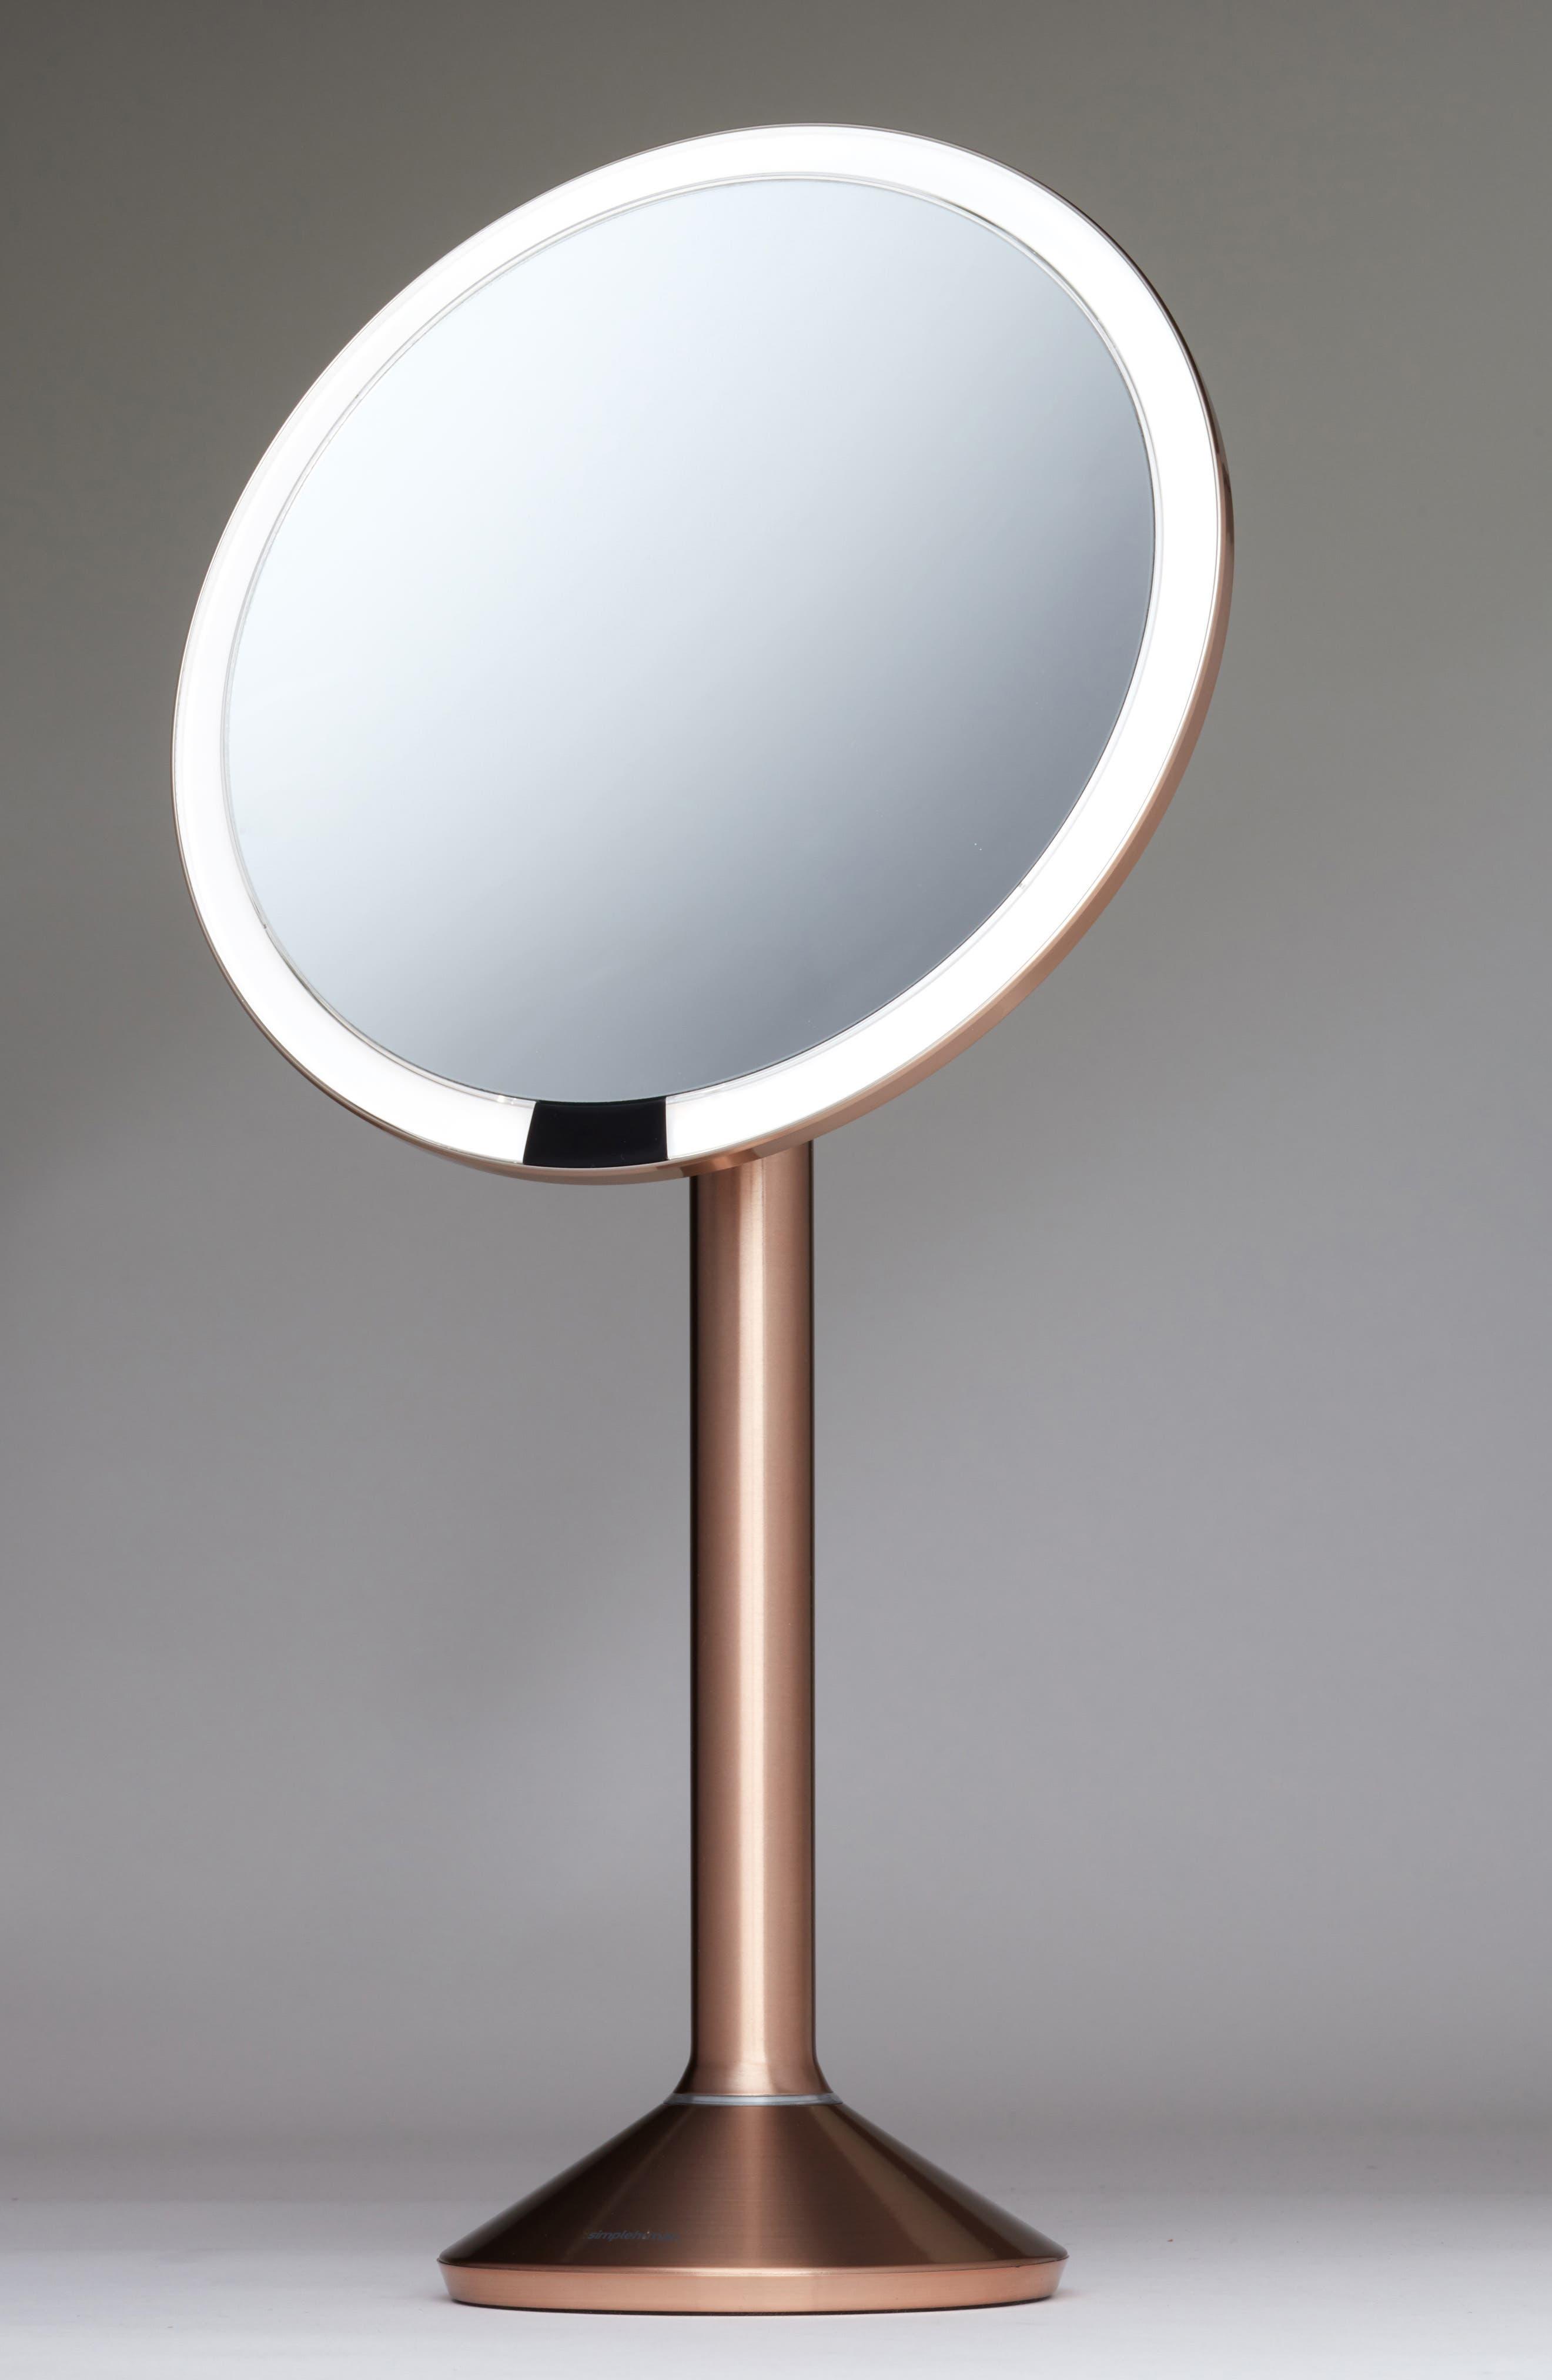 Round Sensor Mirror Pro,                             Alternate thumbnail 2, color,                             220